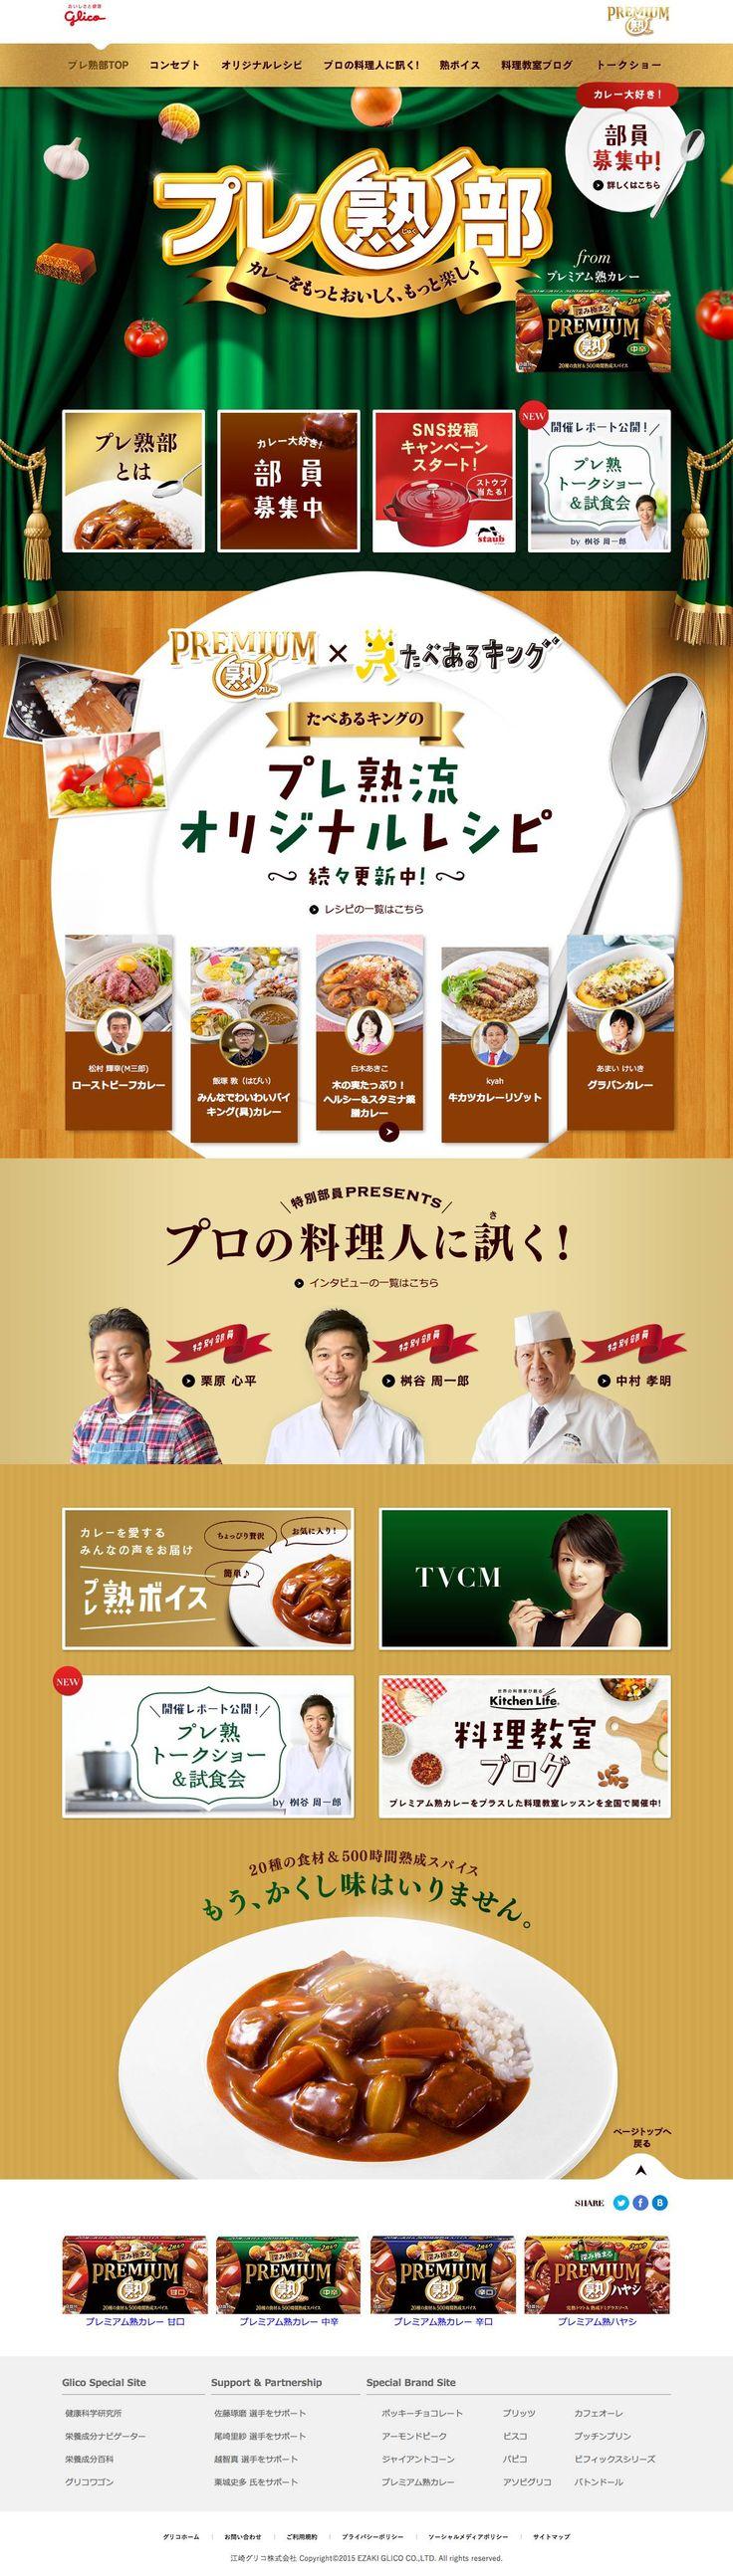 http://cp.glico.jp/pre-juku/